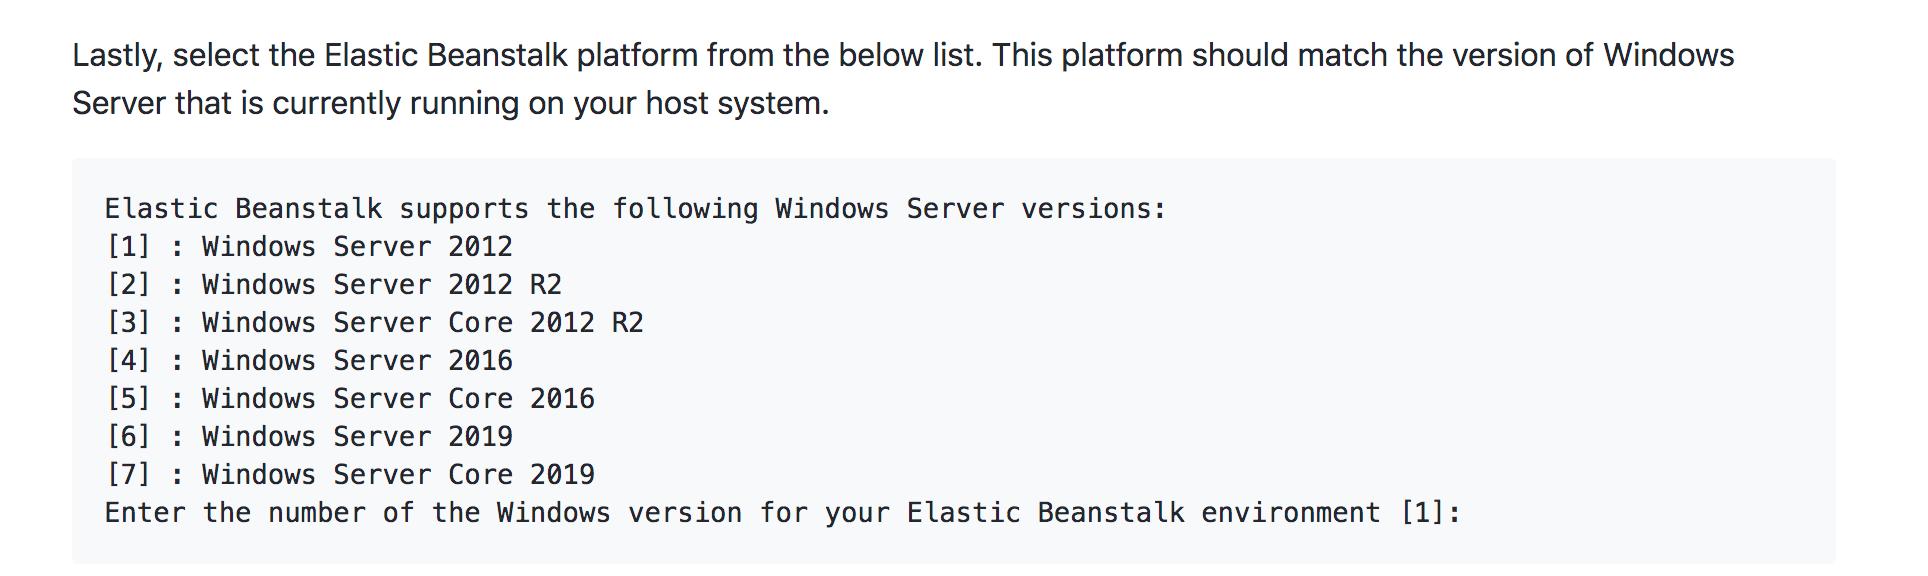 EB platform selection